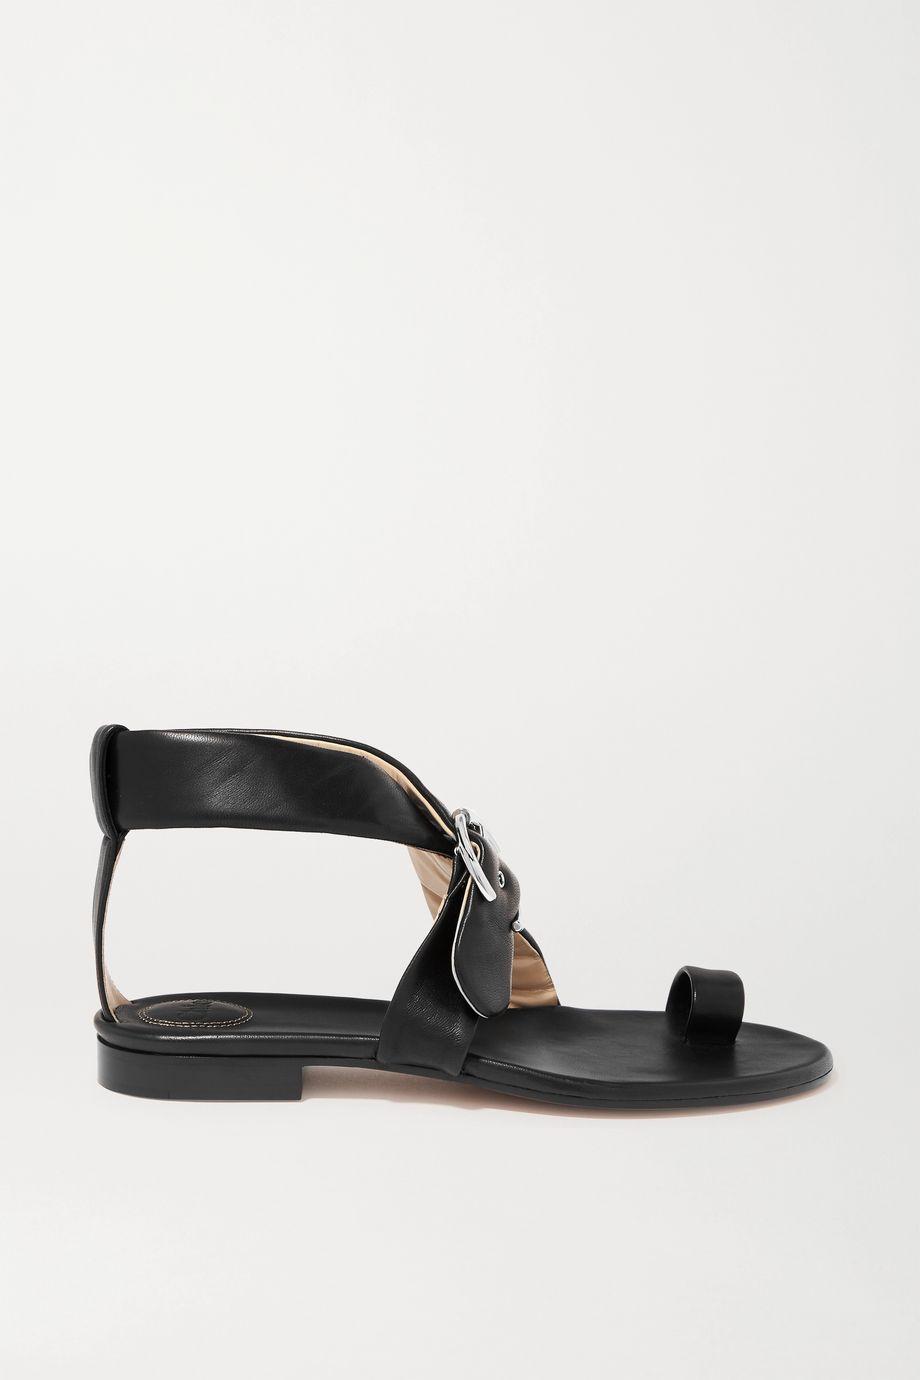 Chloé Roy leather sandals